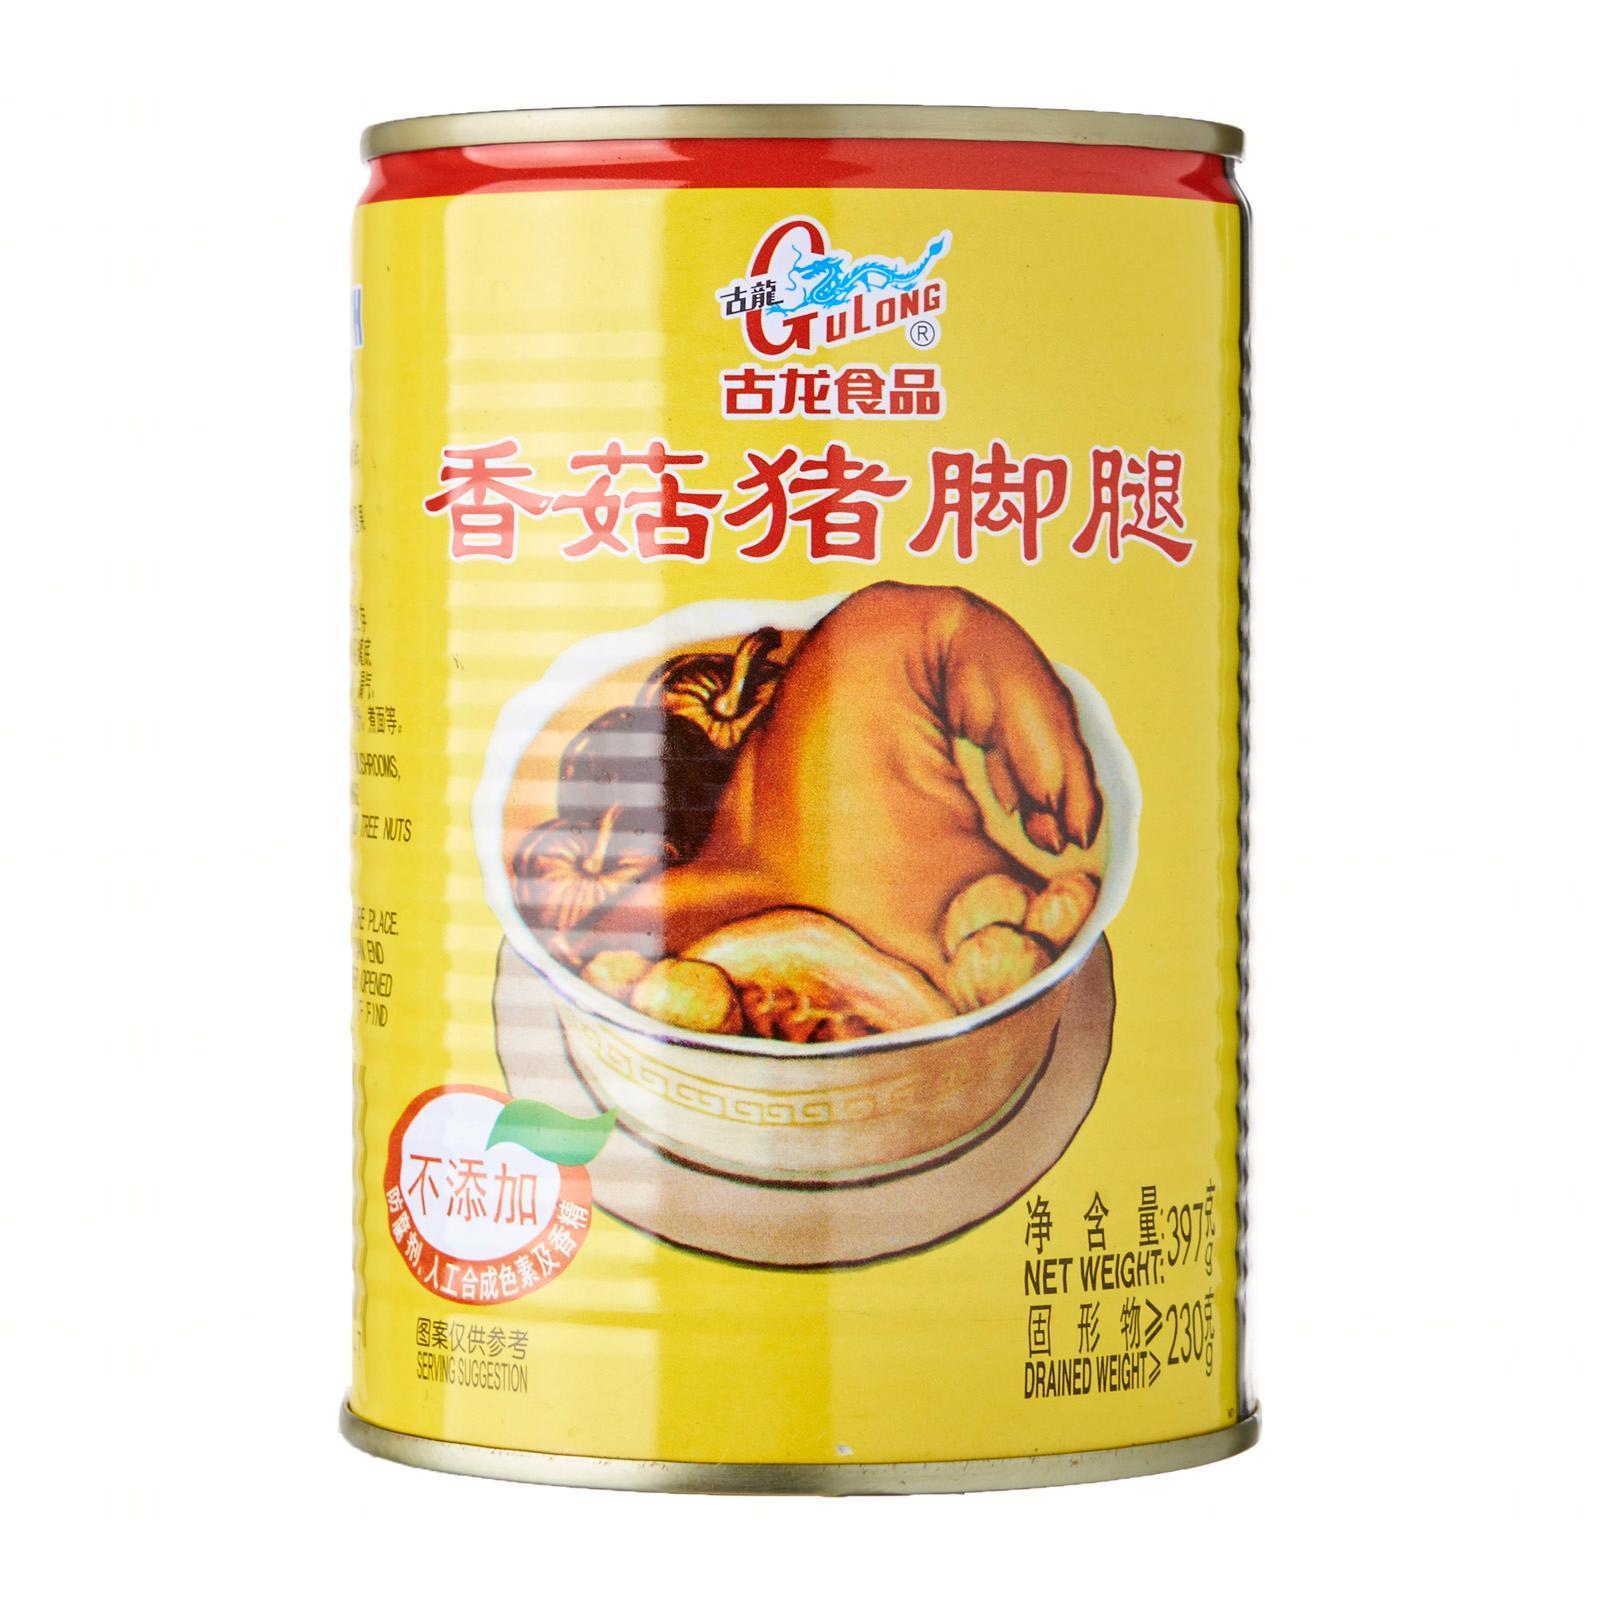 GULONG Braised Pork Leg With Mushroom 397g